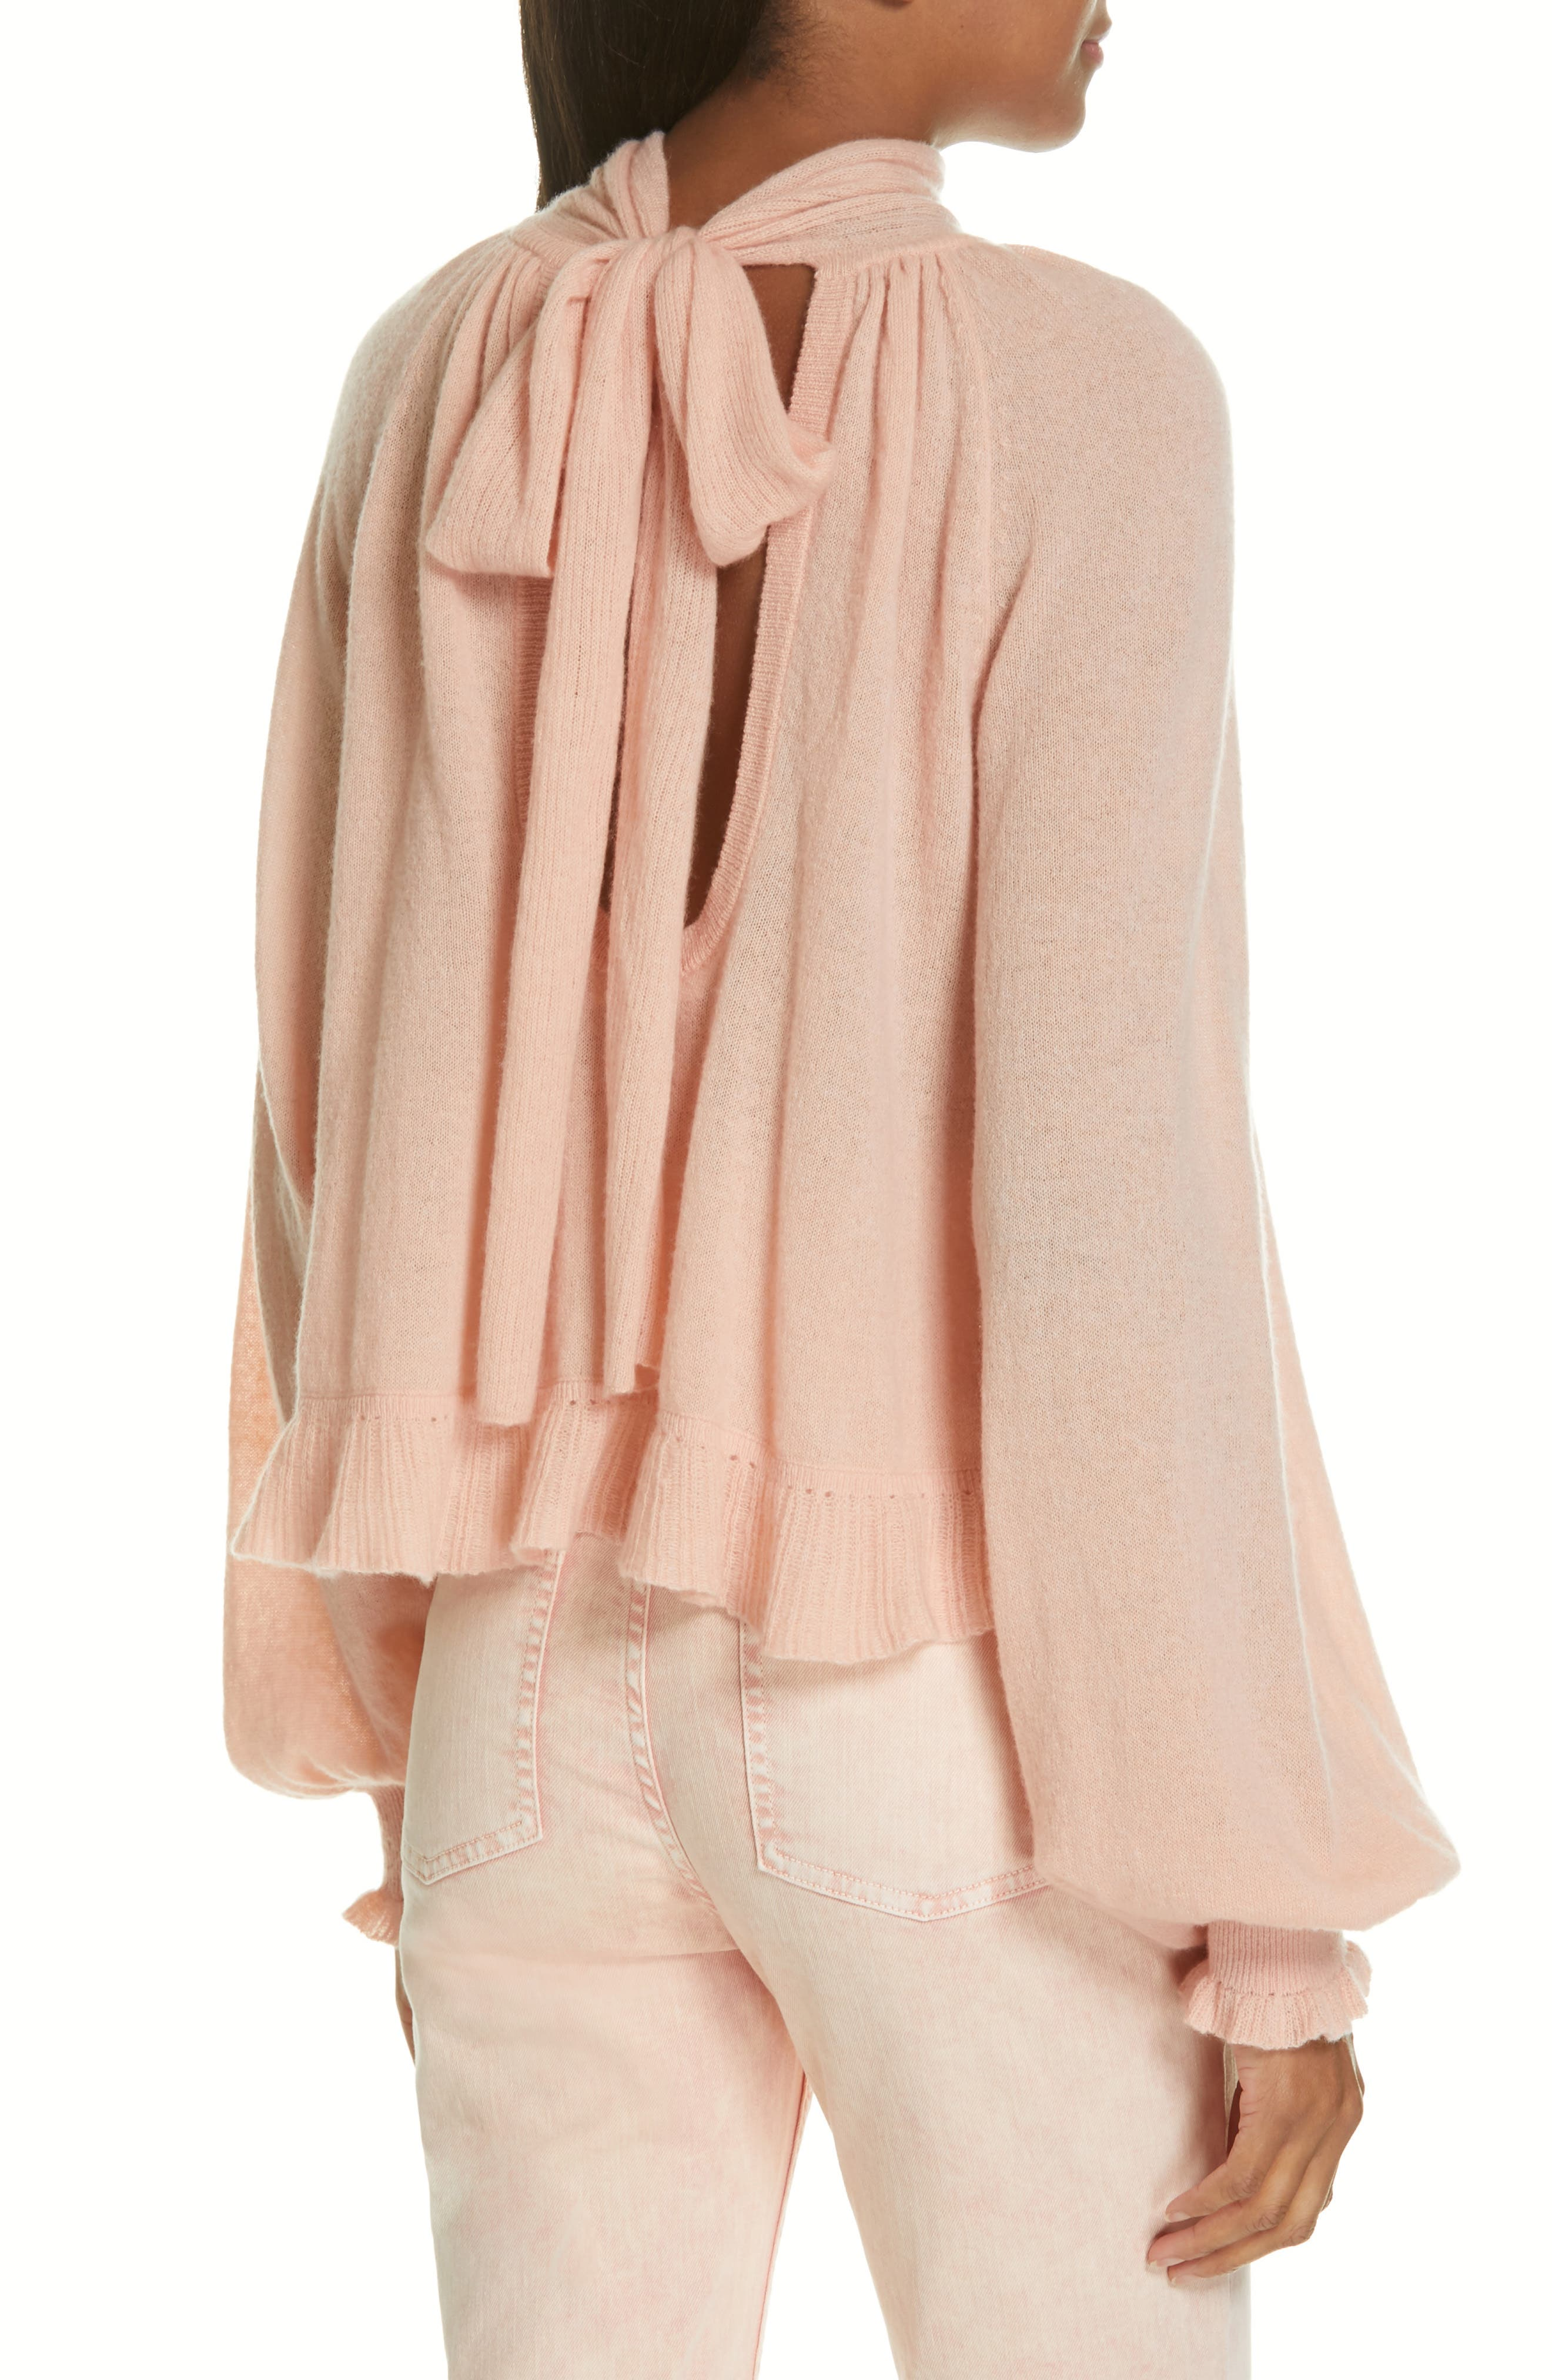 Clover Tie Back Cashmere Blend Sweater,                             Alternate thumbnail 2, color,                             ROSE